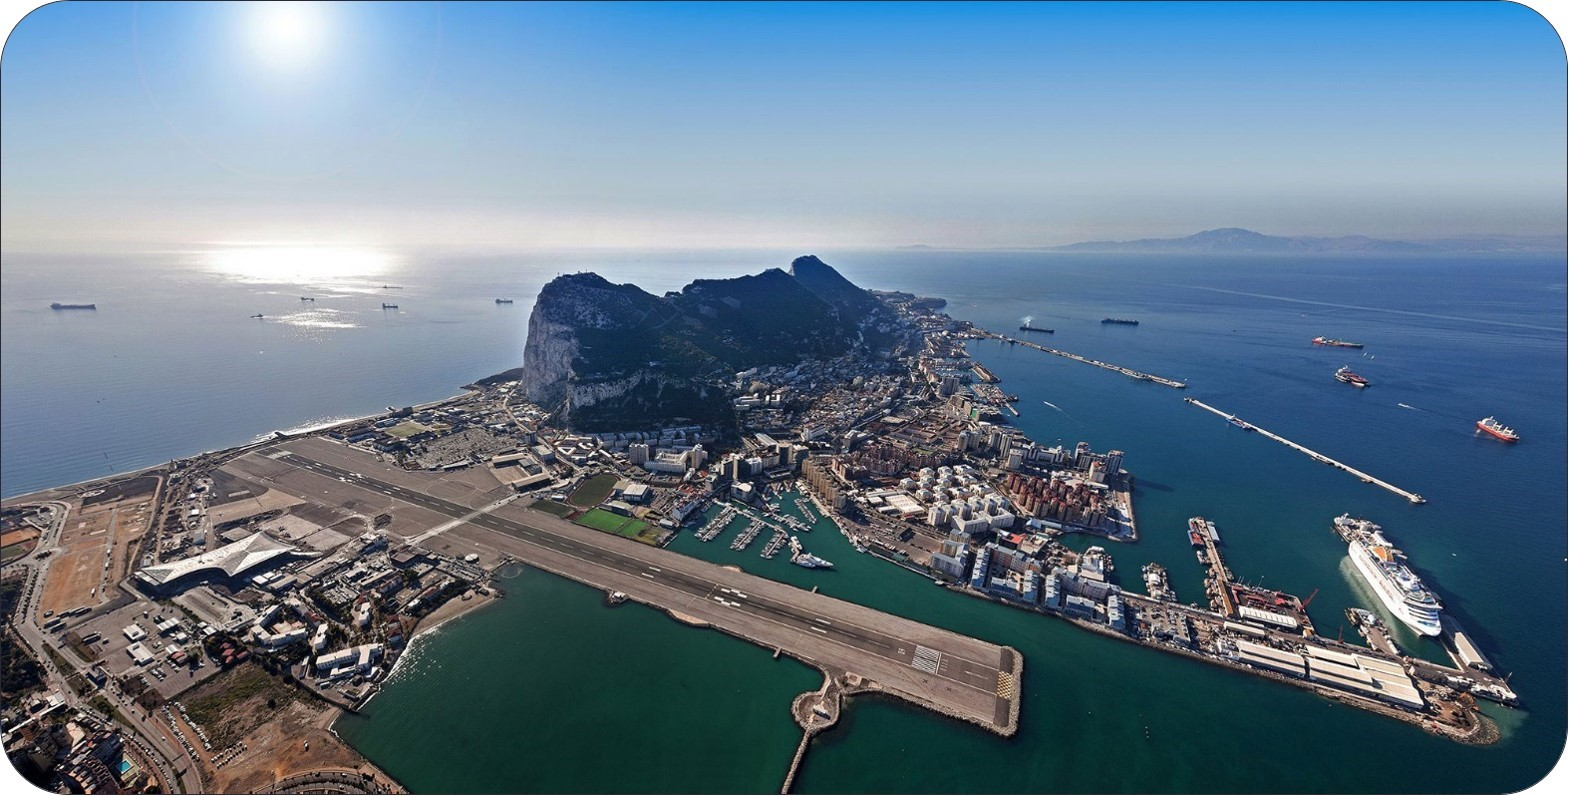 http://www.eunews.it/wp-content/uploads/2016/01/Gibilterra-aeroporto.jpeg.jpg